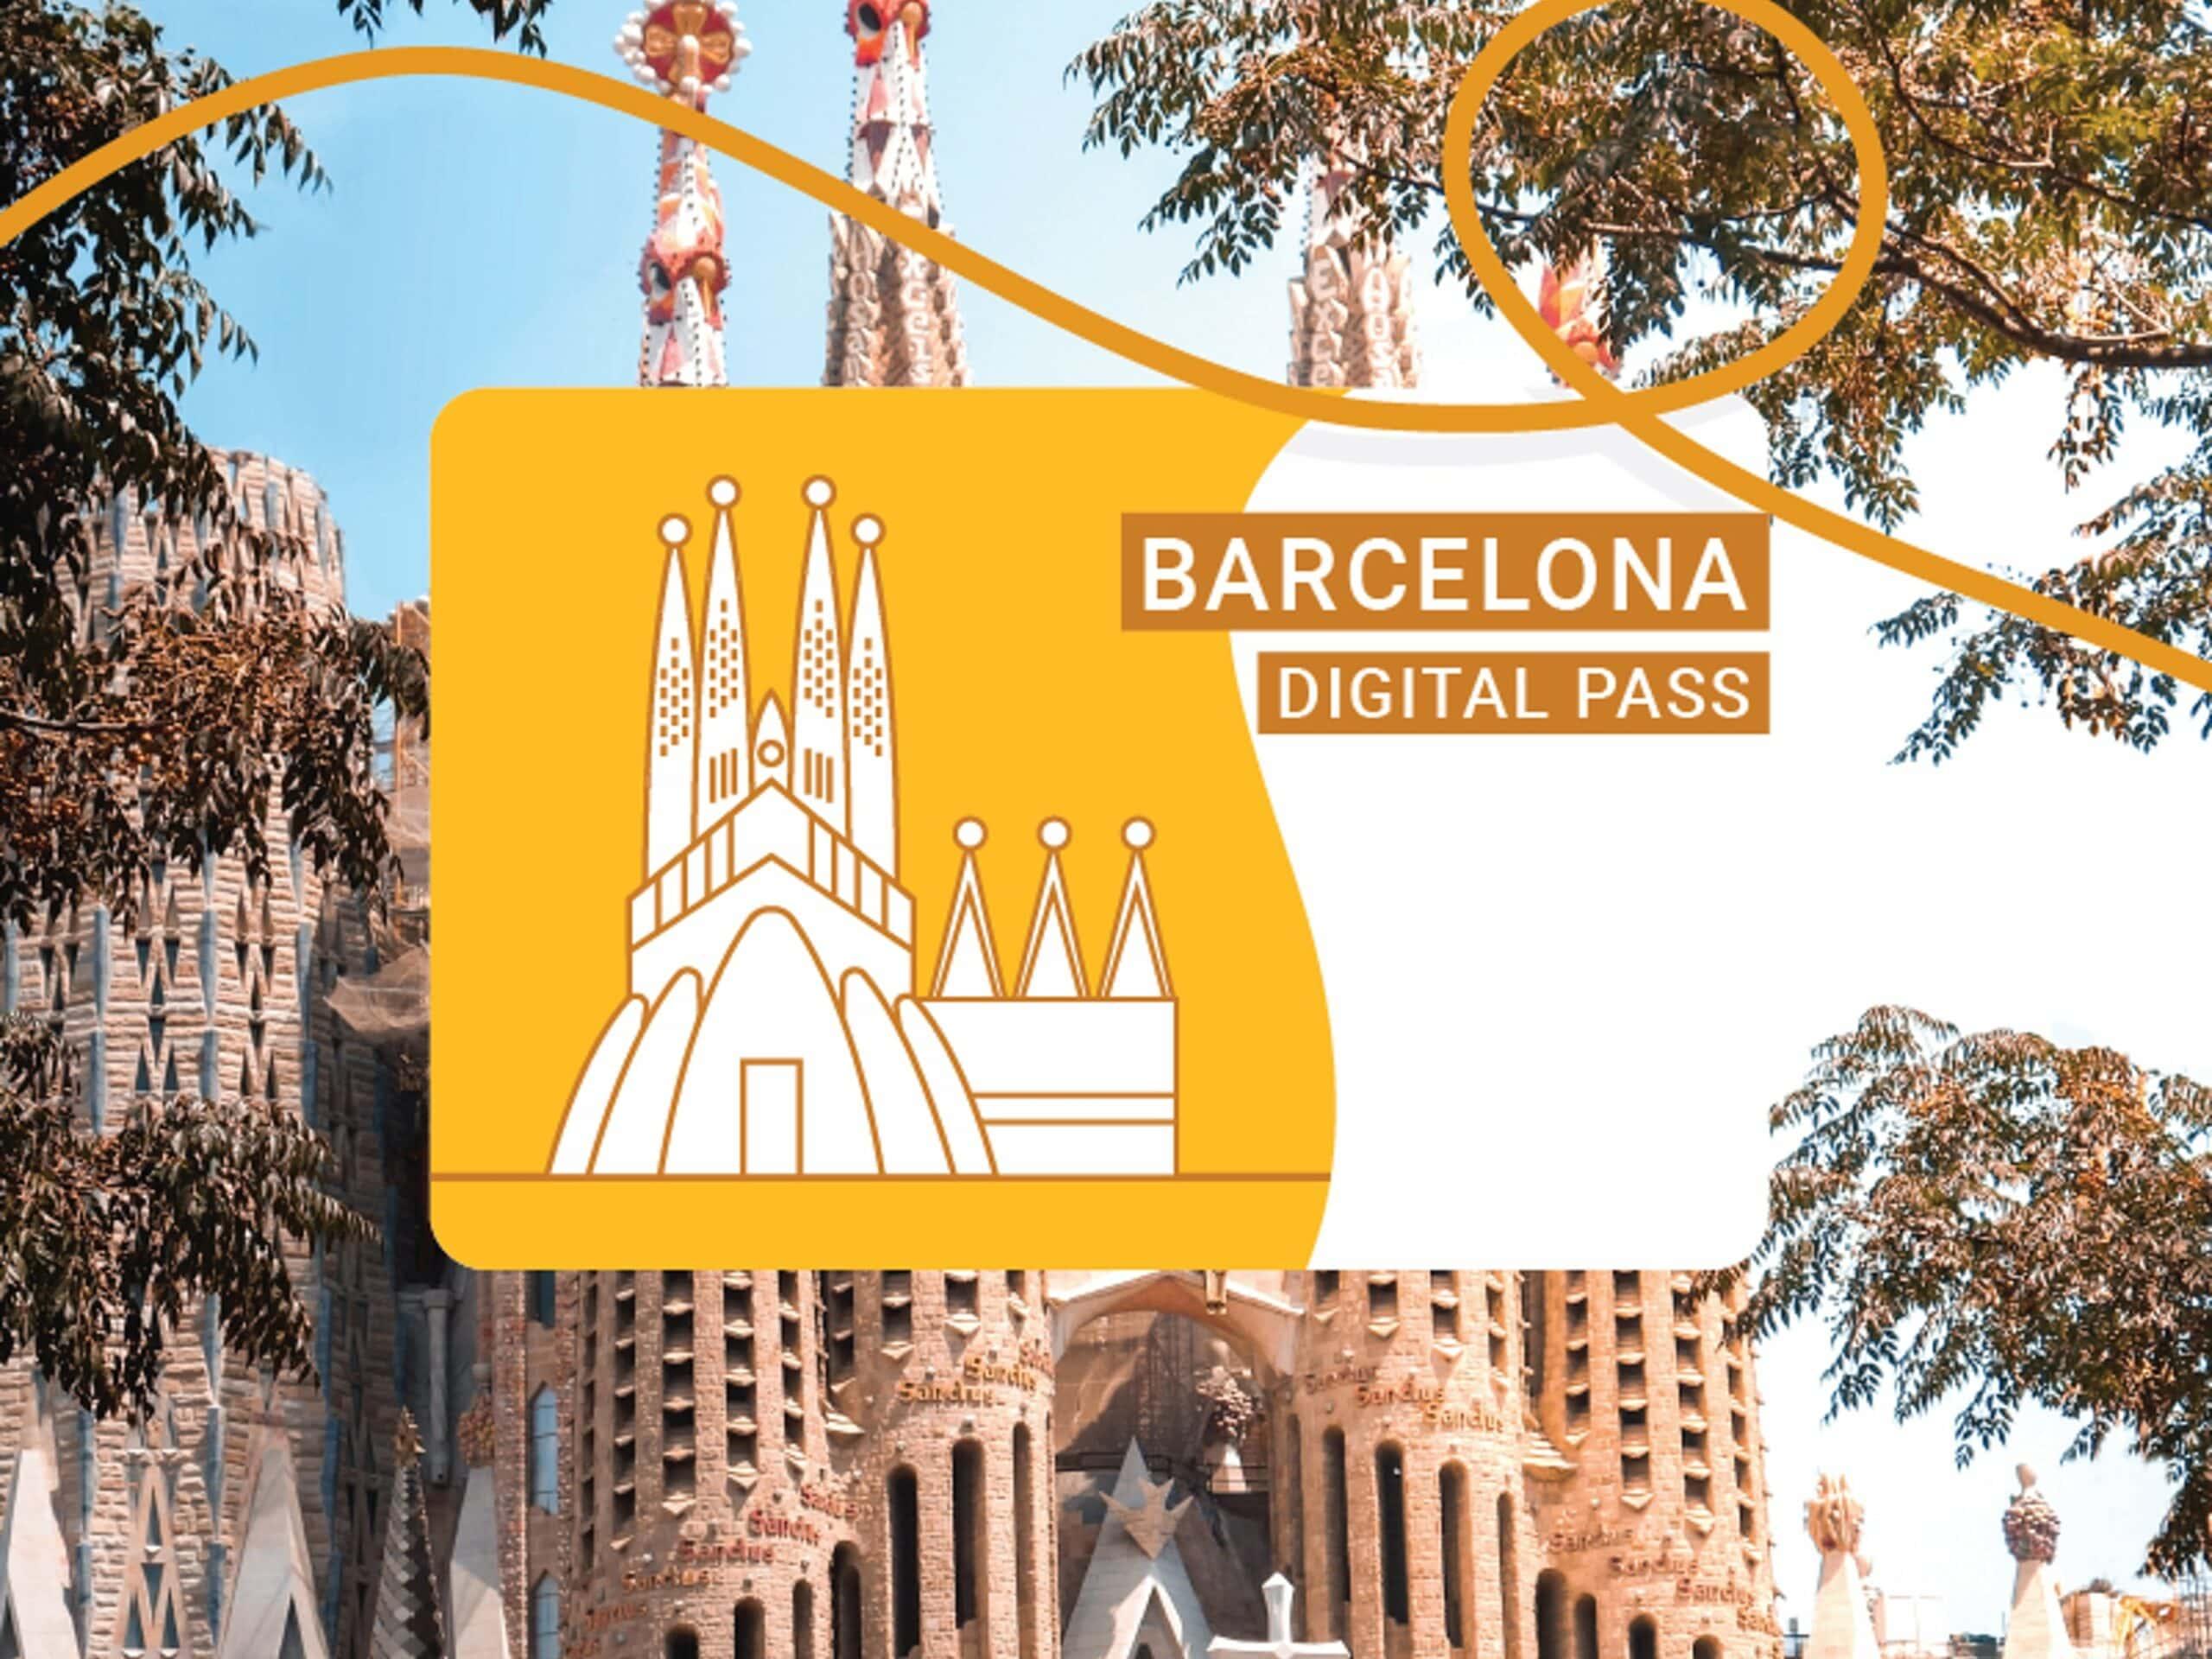 Barcelona Digital City Pass